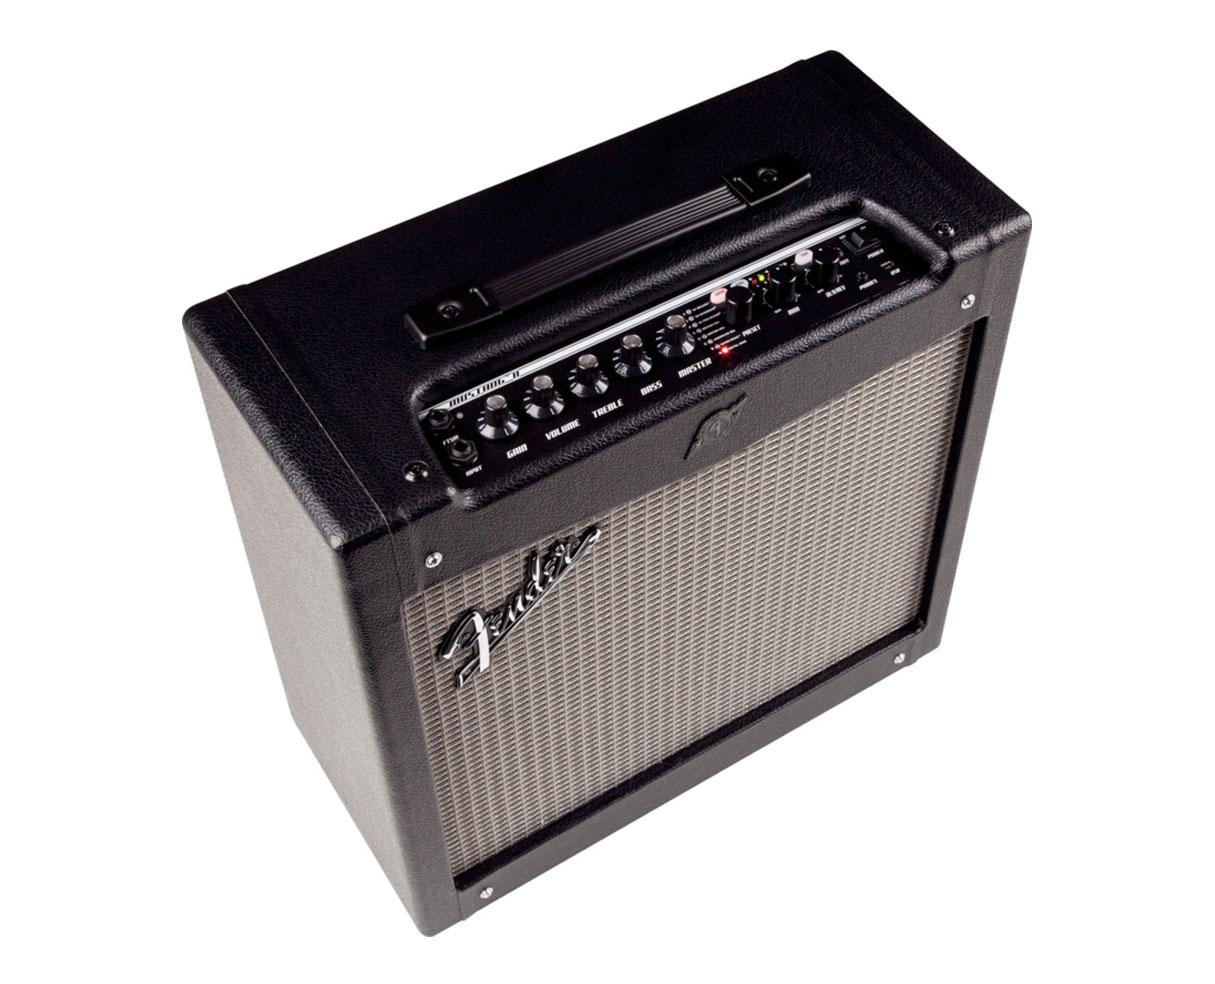 fender mustang ii v 2 guitar combo modeling amp amplifier effects proaudiostar ebay. Black Bedroom Furniture Sets. Home Design Ideas